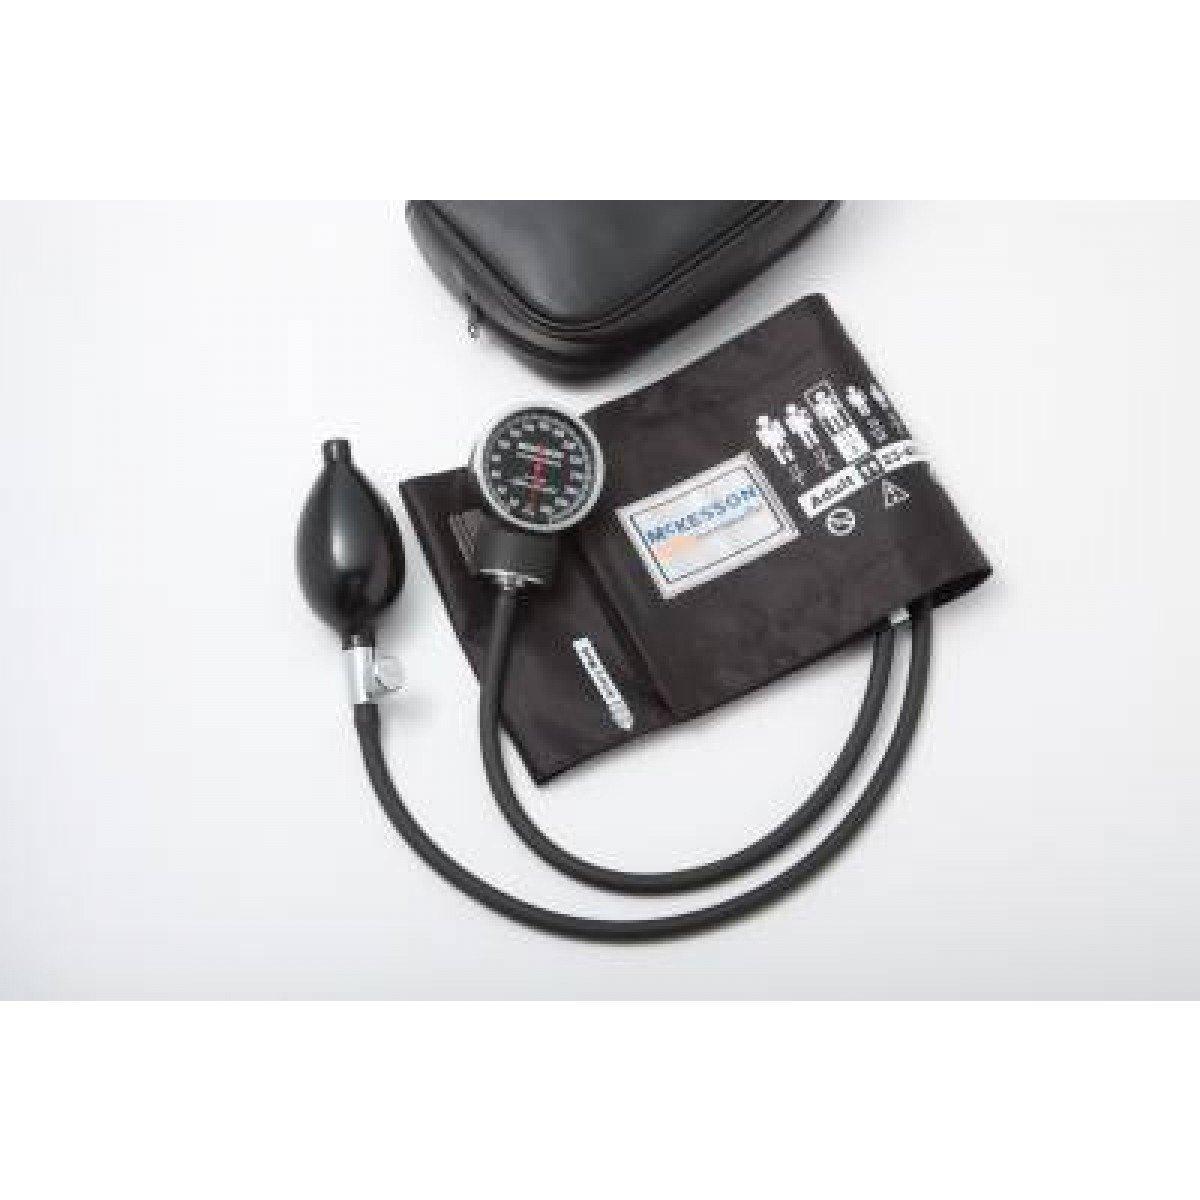 MCK81132500 - Mckesson Brand Aneroid Sphygmomanometer McKesson Pocket Style Hand Held 2-Tube Thigh Thigh